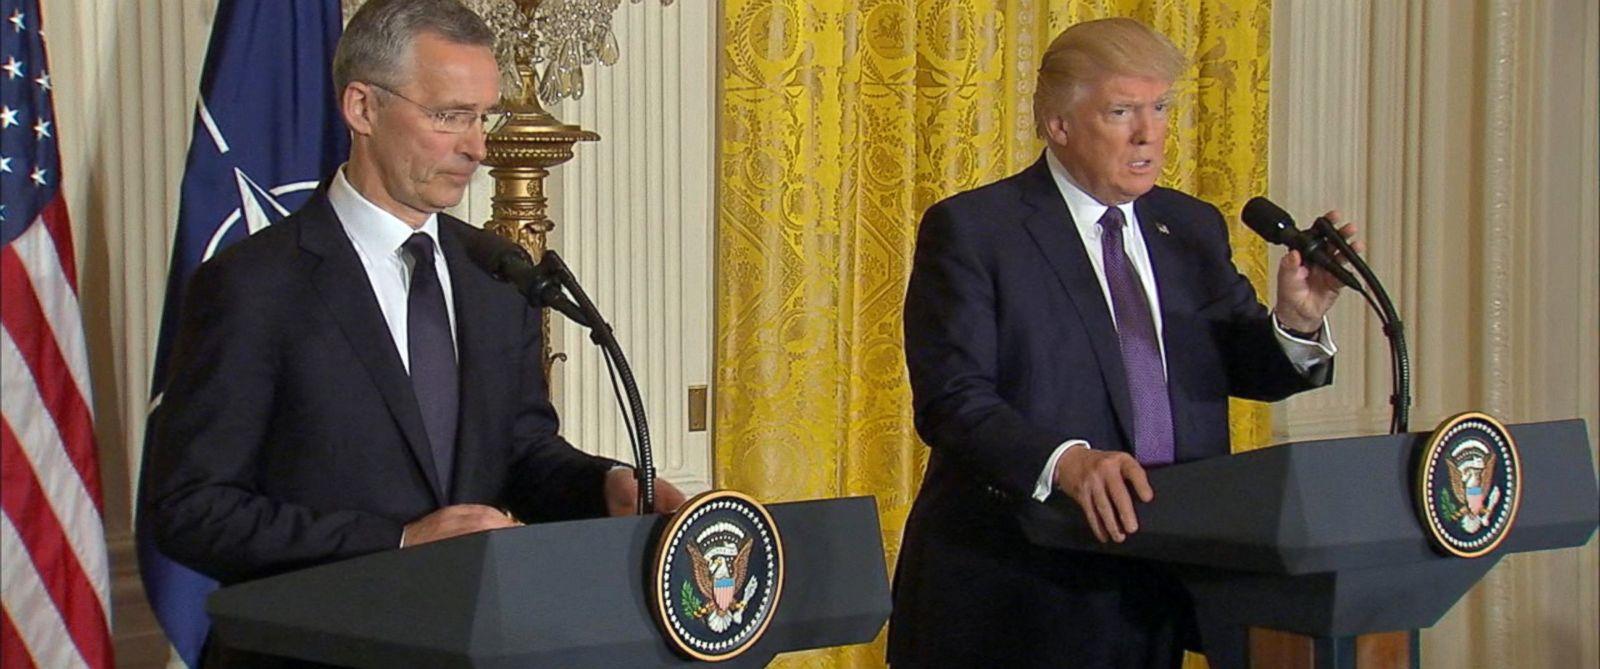 PHOTO: President Donald Trump and NATO Secretary-General Jens Stoltenberg speak in a press conference in Washington, April 12, 2017.